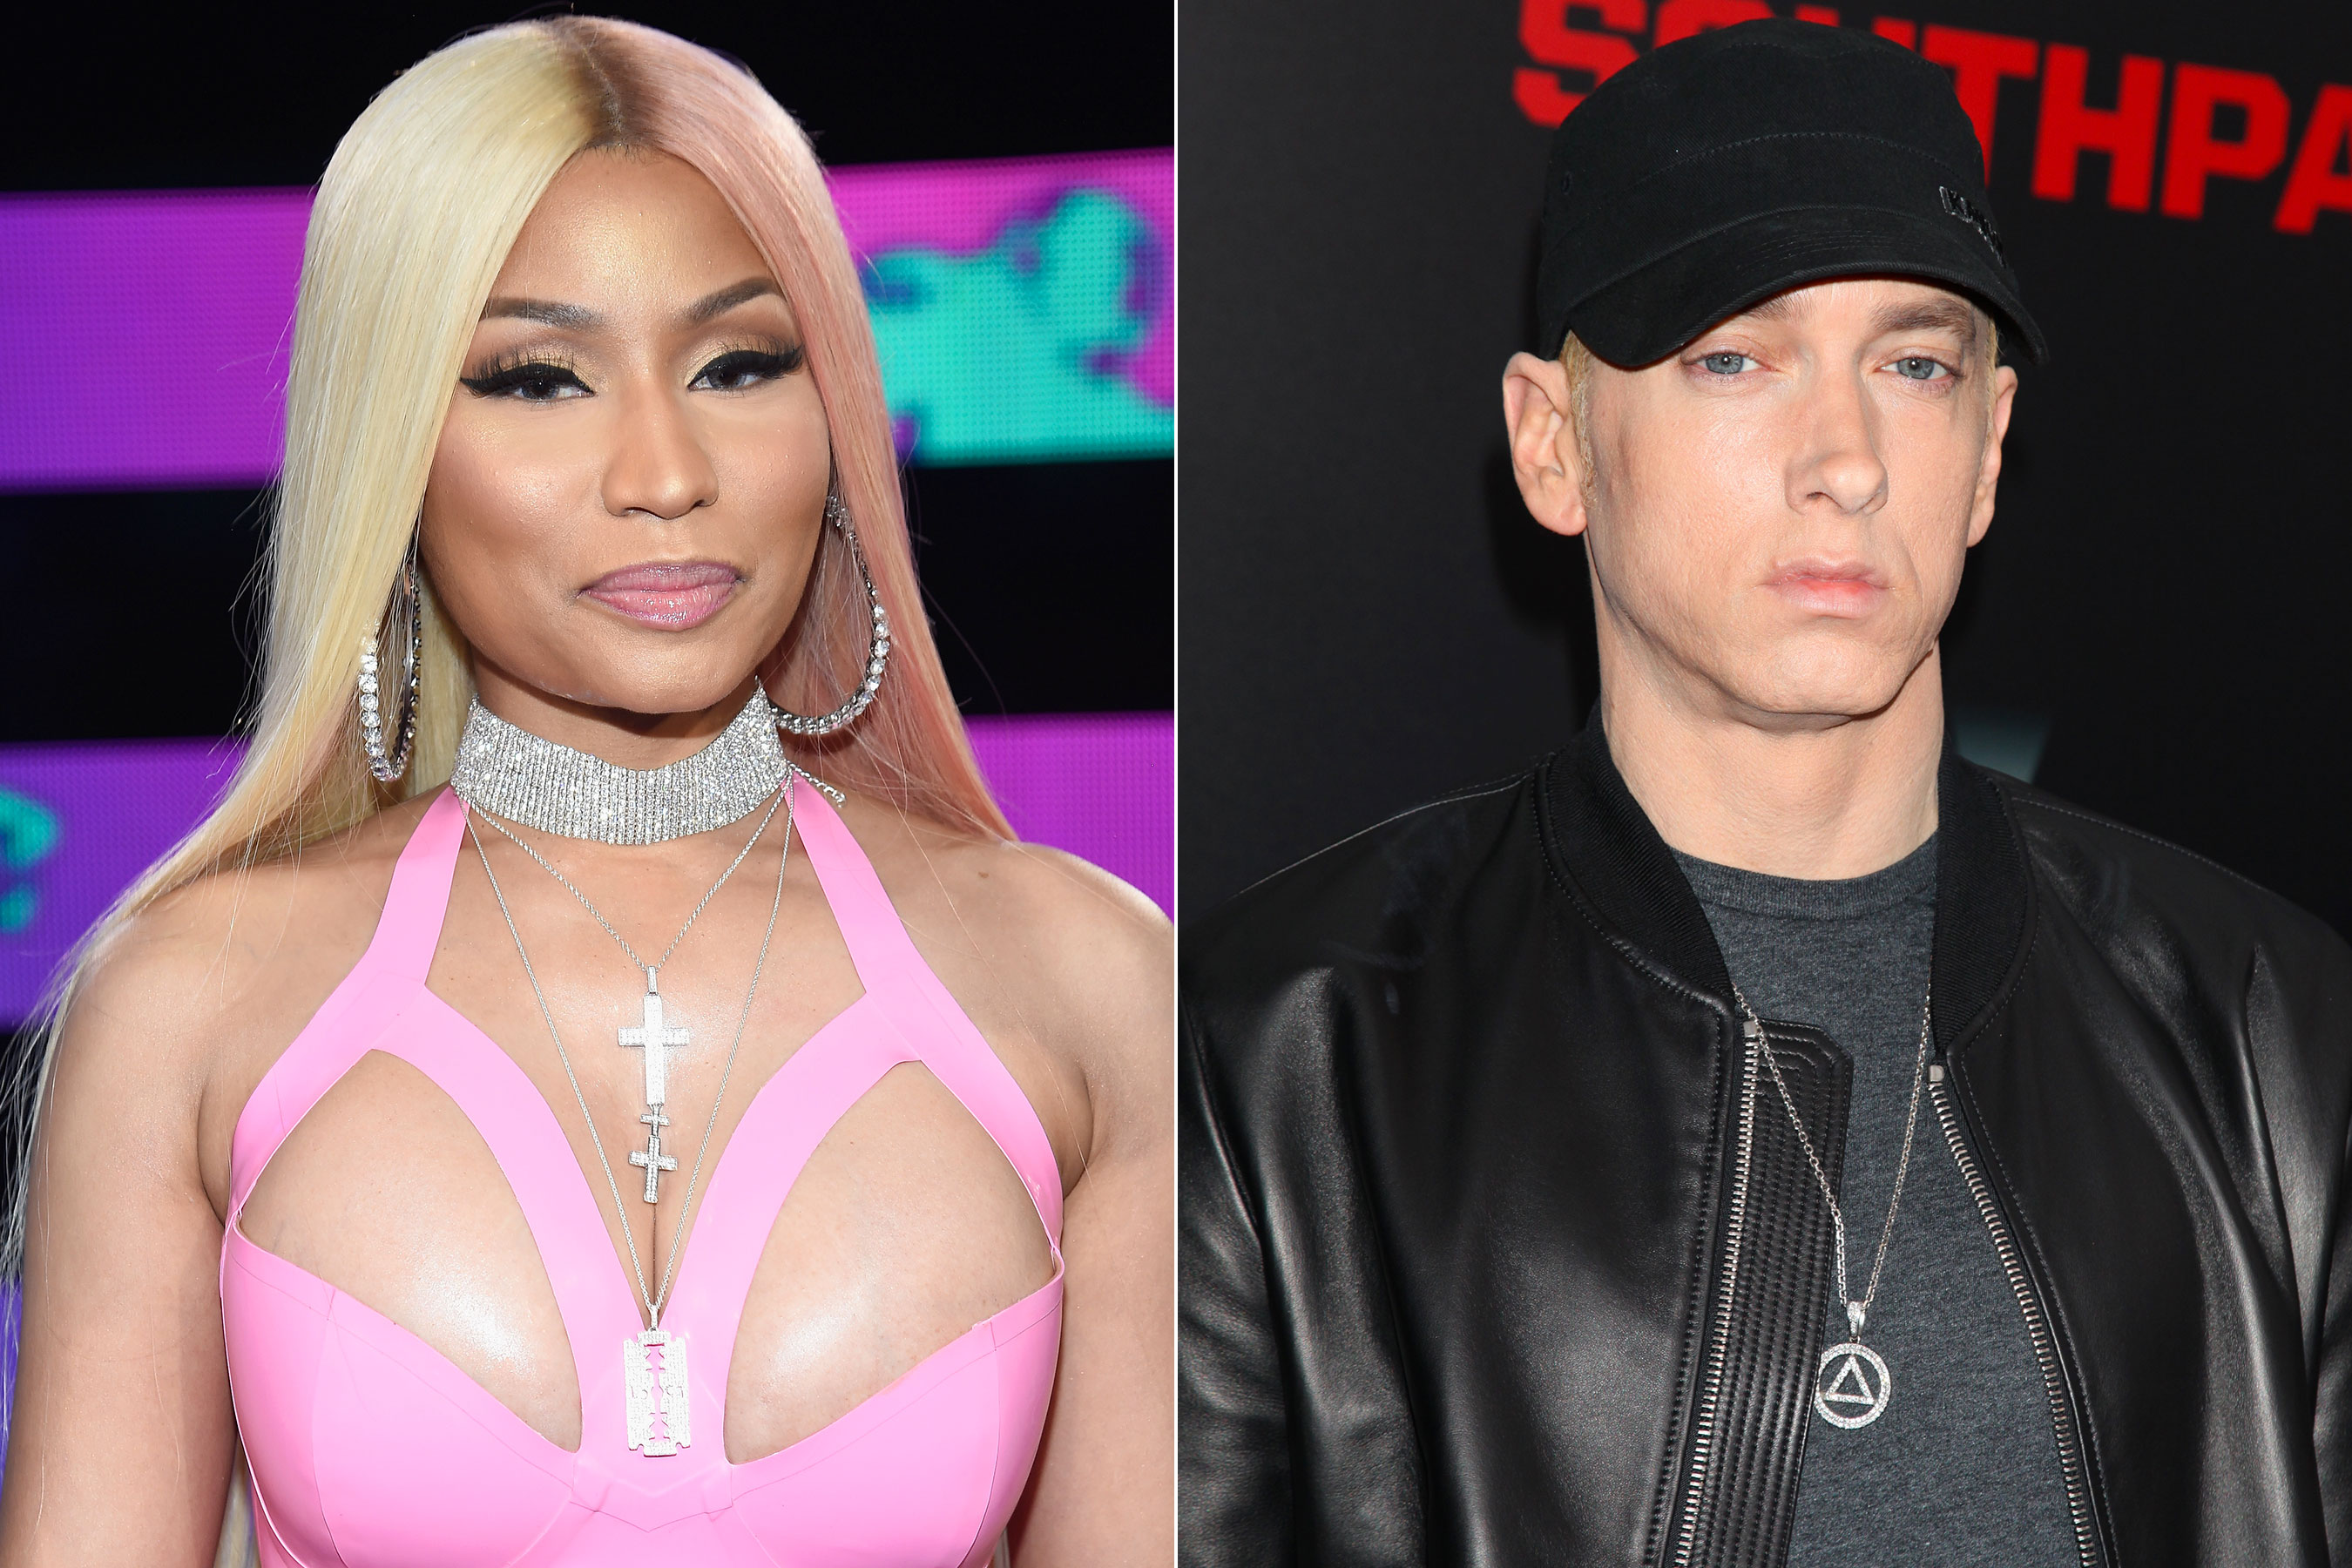 Nicki Minaj confirmó que está saliendo con Eminem